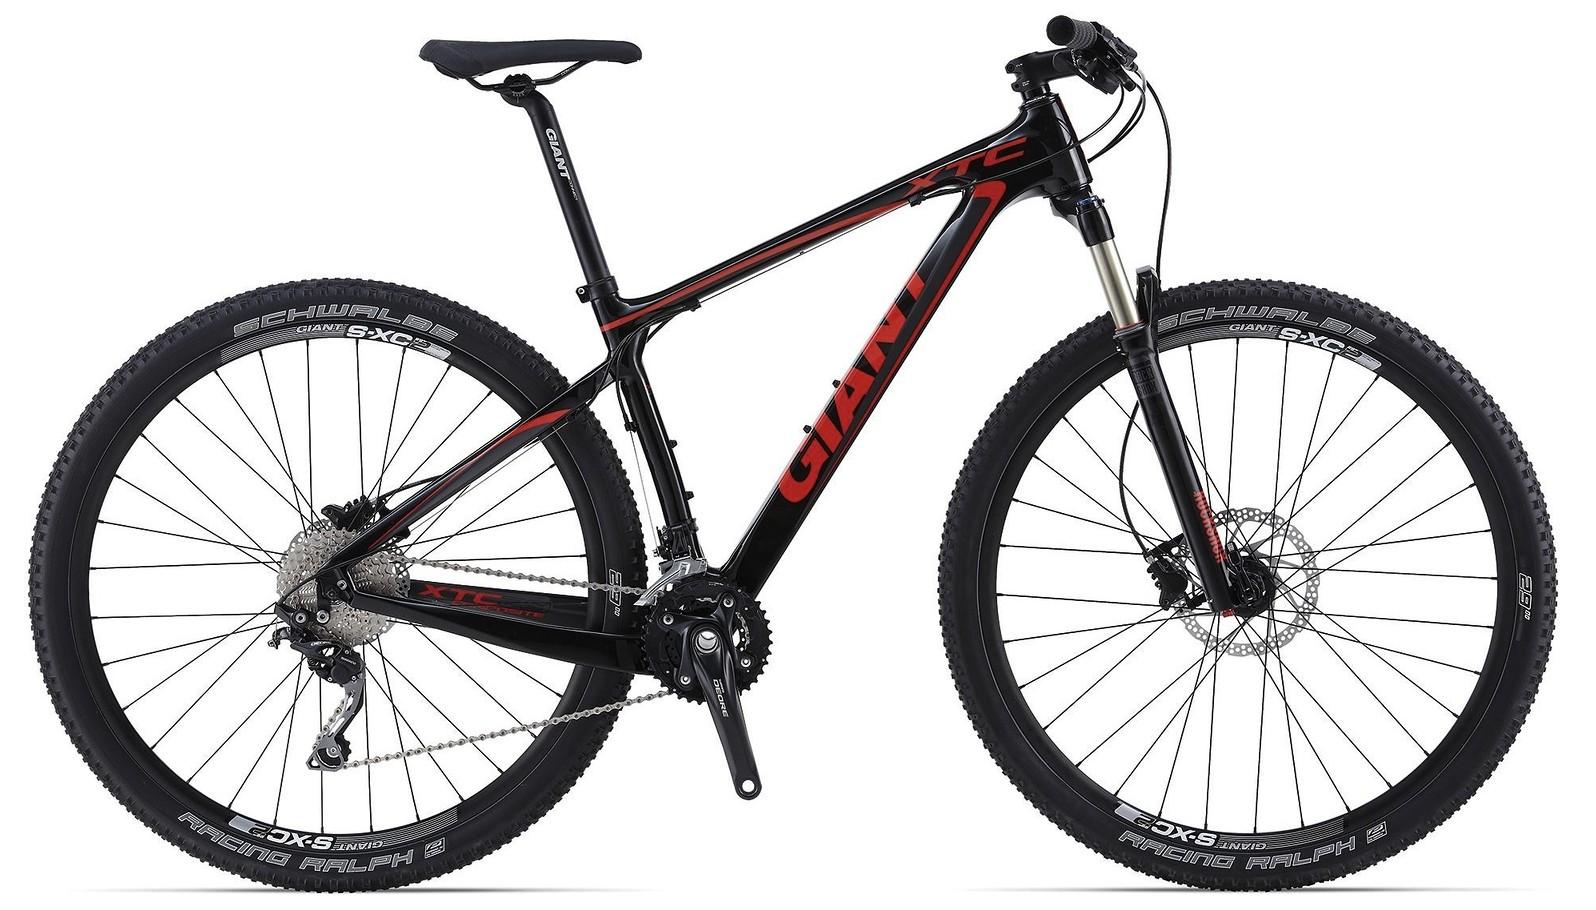 2014 Giant XTC Composite 29er 2 Bike XtC_Composite_29er_2